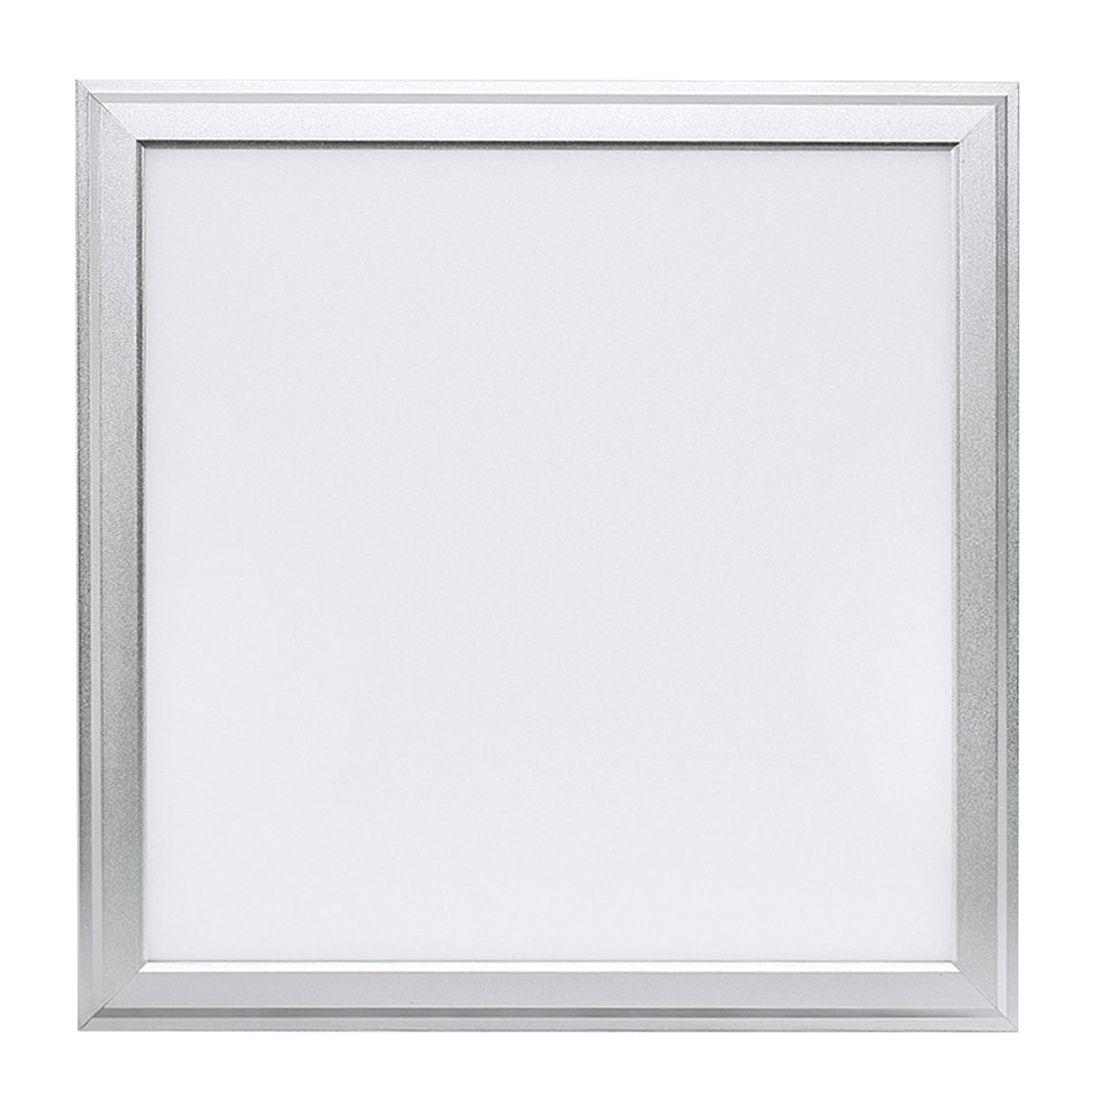 Ultraslim Square 30X30cm Daylight Warm White LED Panel Light Recessed Lamp Pendant Lights Set  SMD 2835 ,2800K,18W large illumination area ul panel light 4 x1 1200x300mm hanging recessed wall surface mounting no gare soft flat light